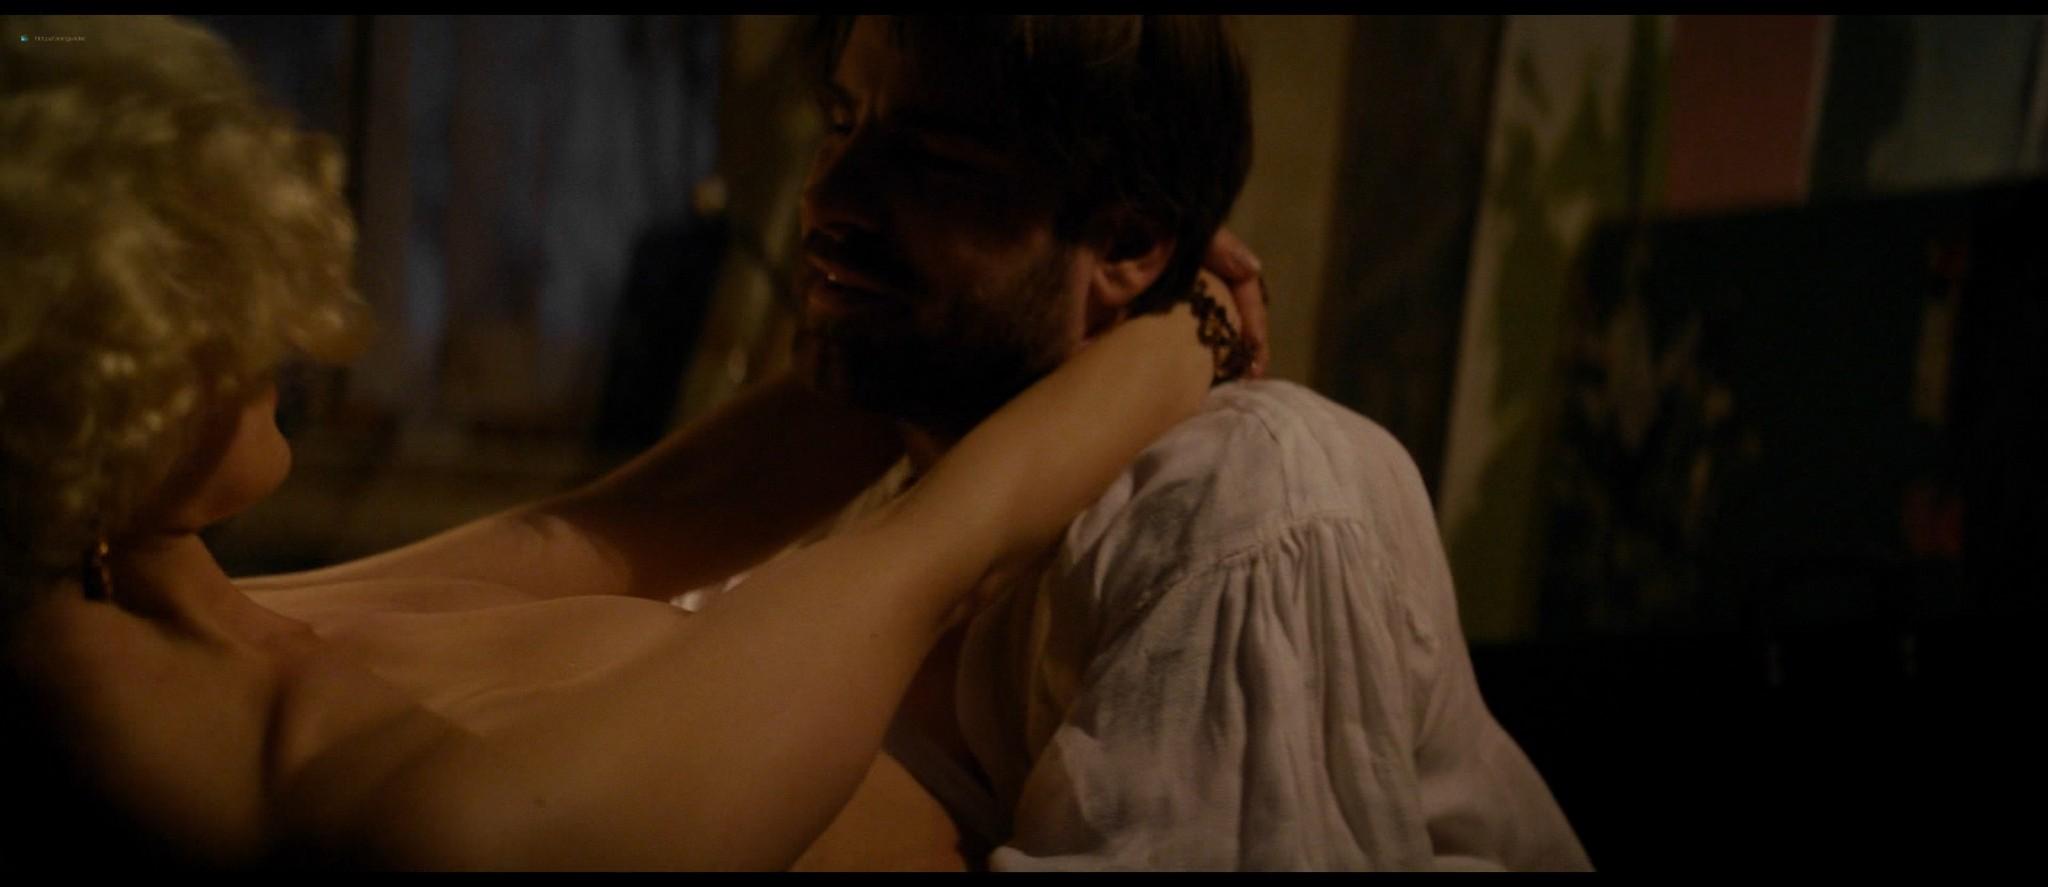 Olga Kurylenko hot and sexy in The Room (2019) HD 1080p BluRay (6)